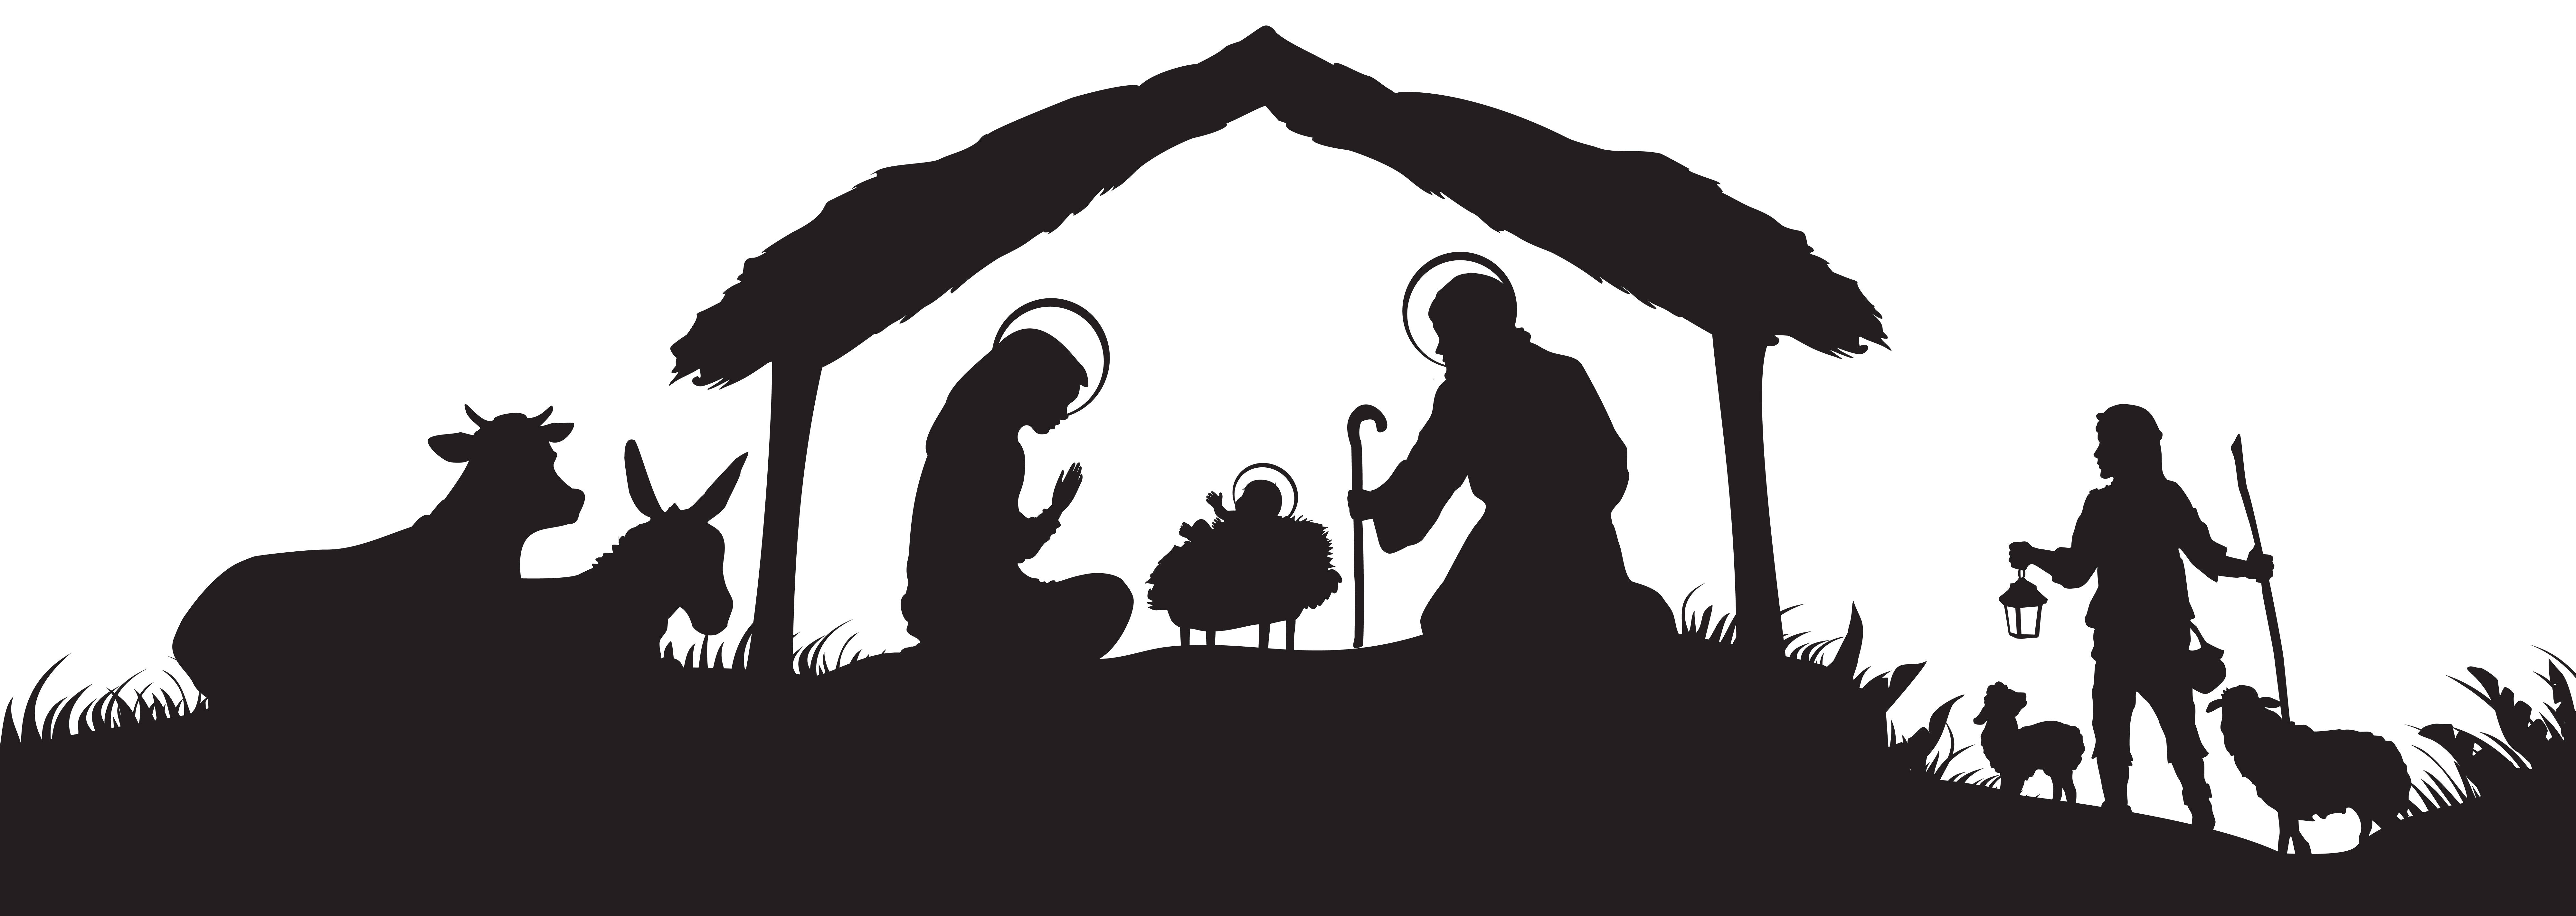 free christmas nativity clipart #18.